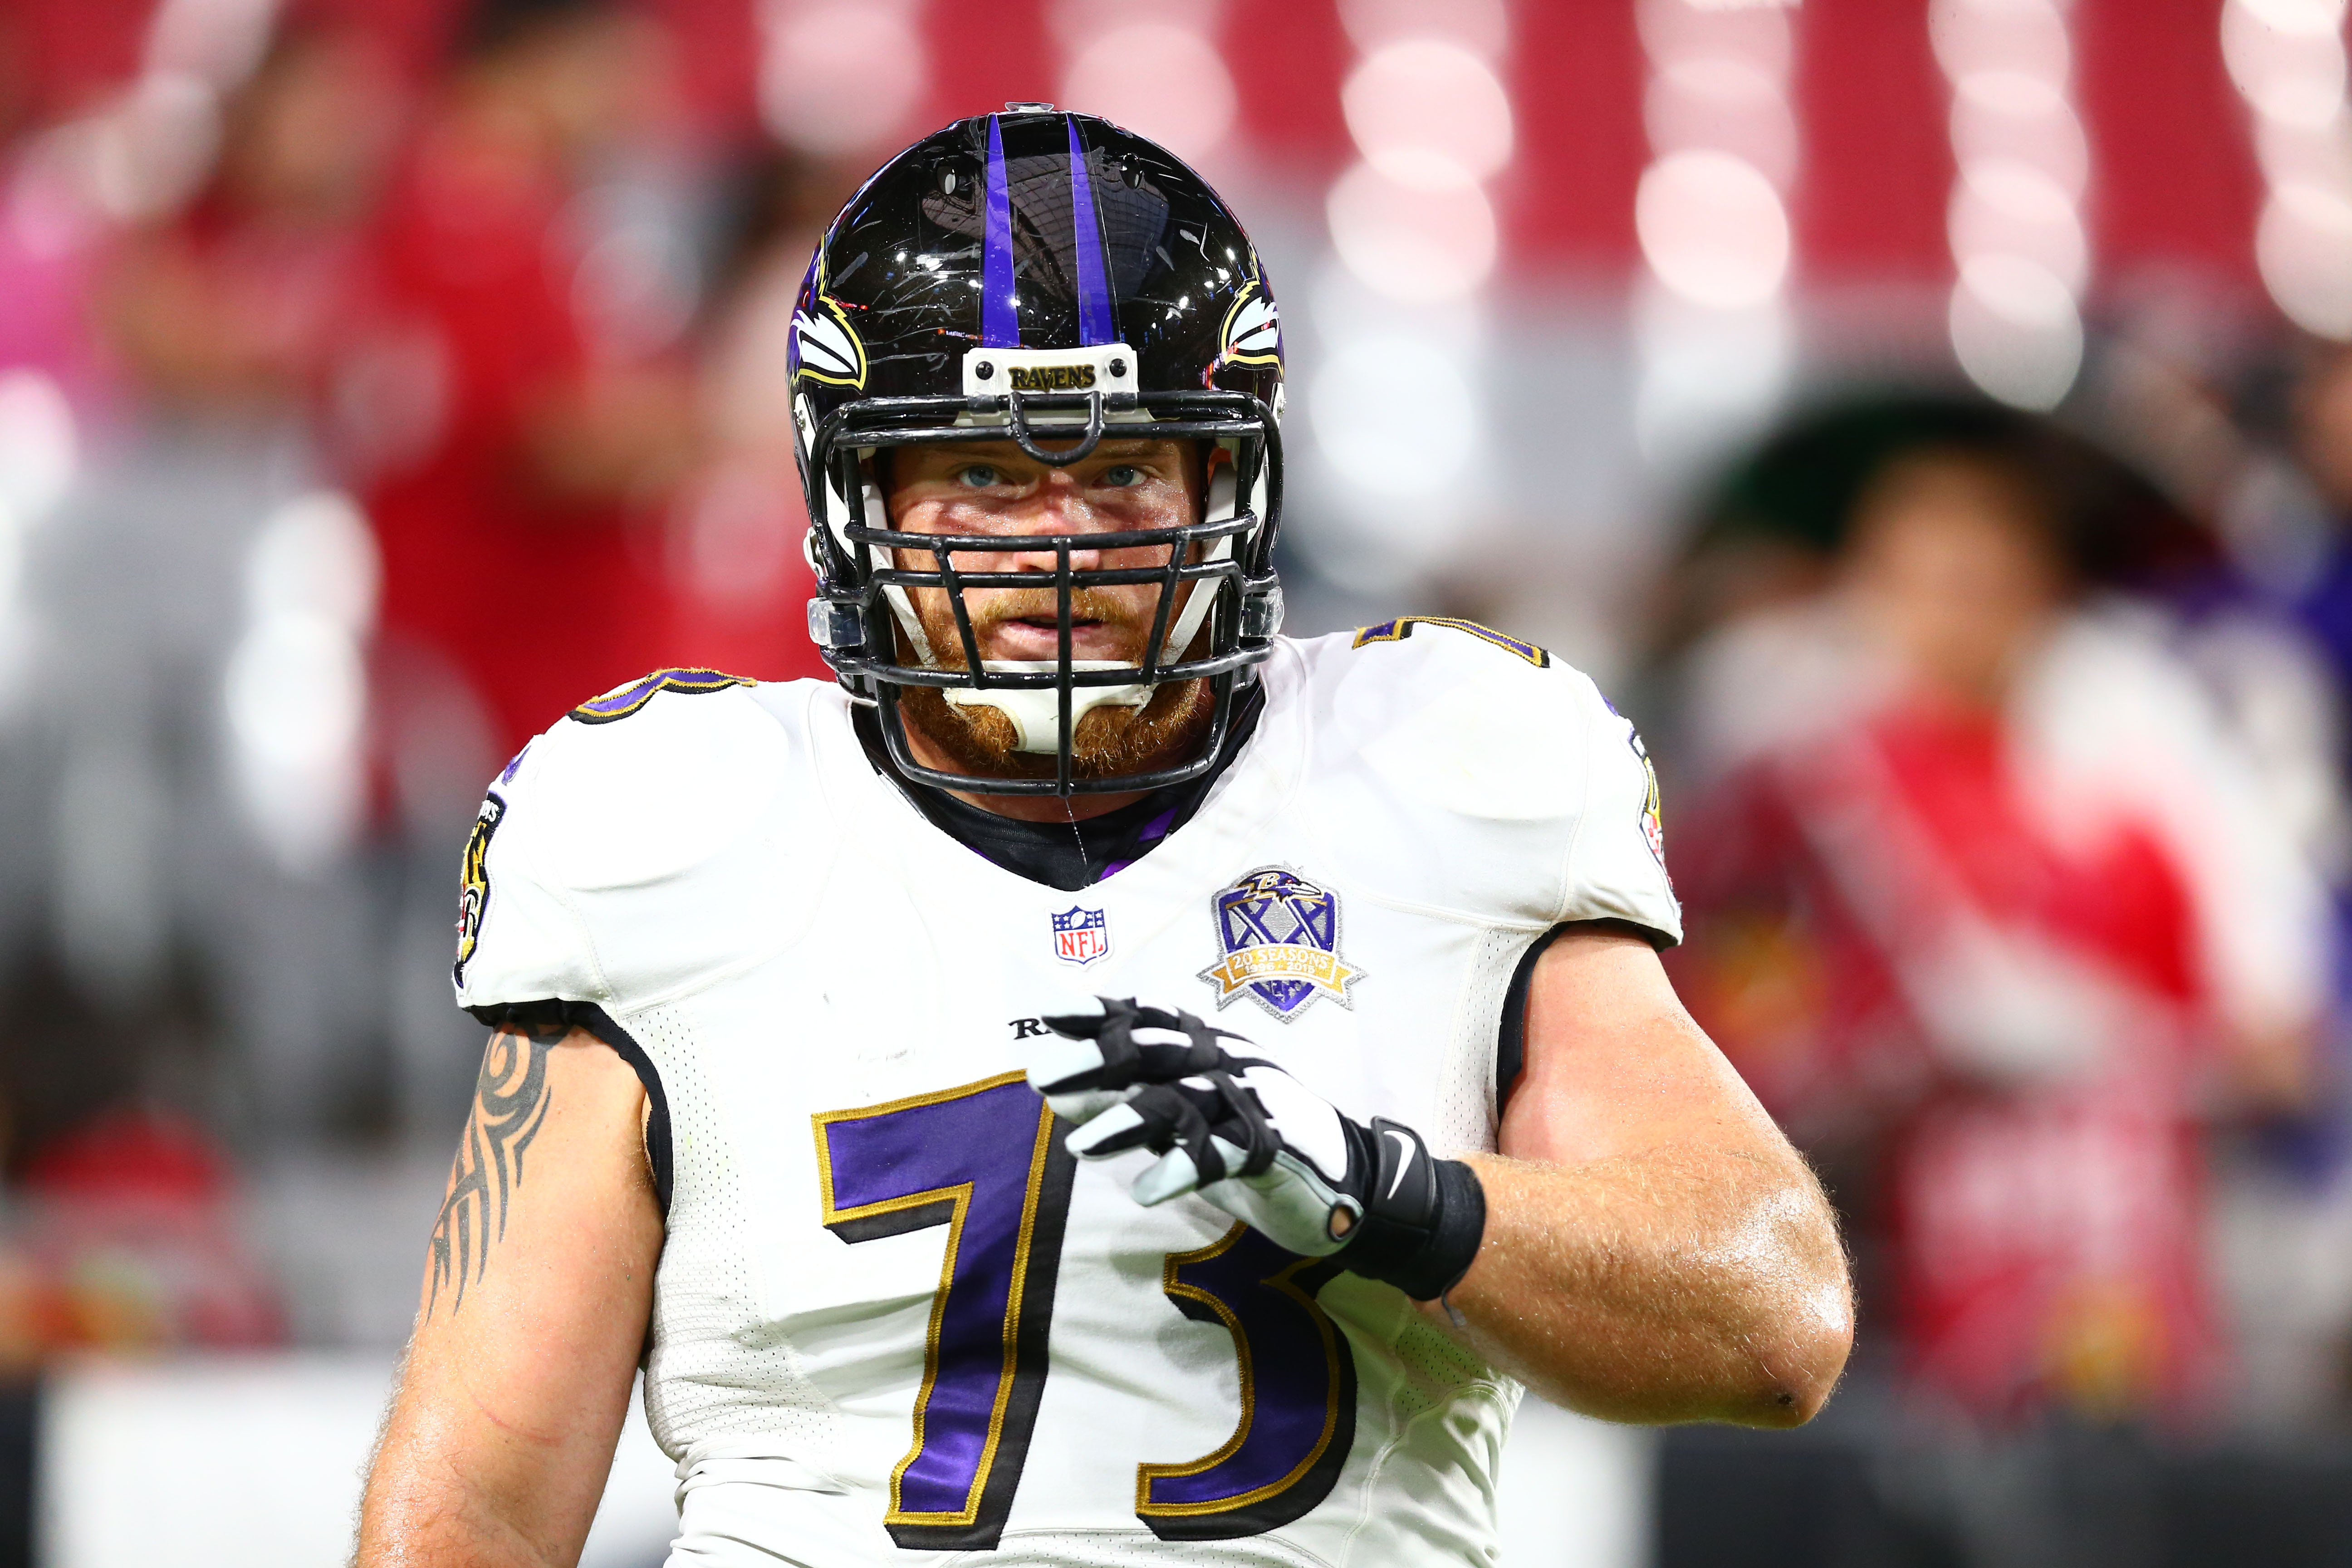 NFL: Baltimore Ravens at Arizona Cardinals